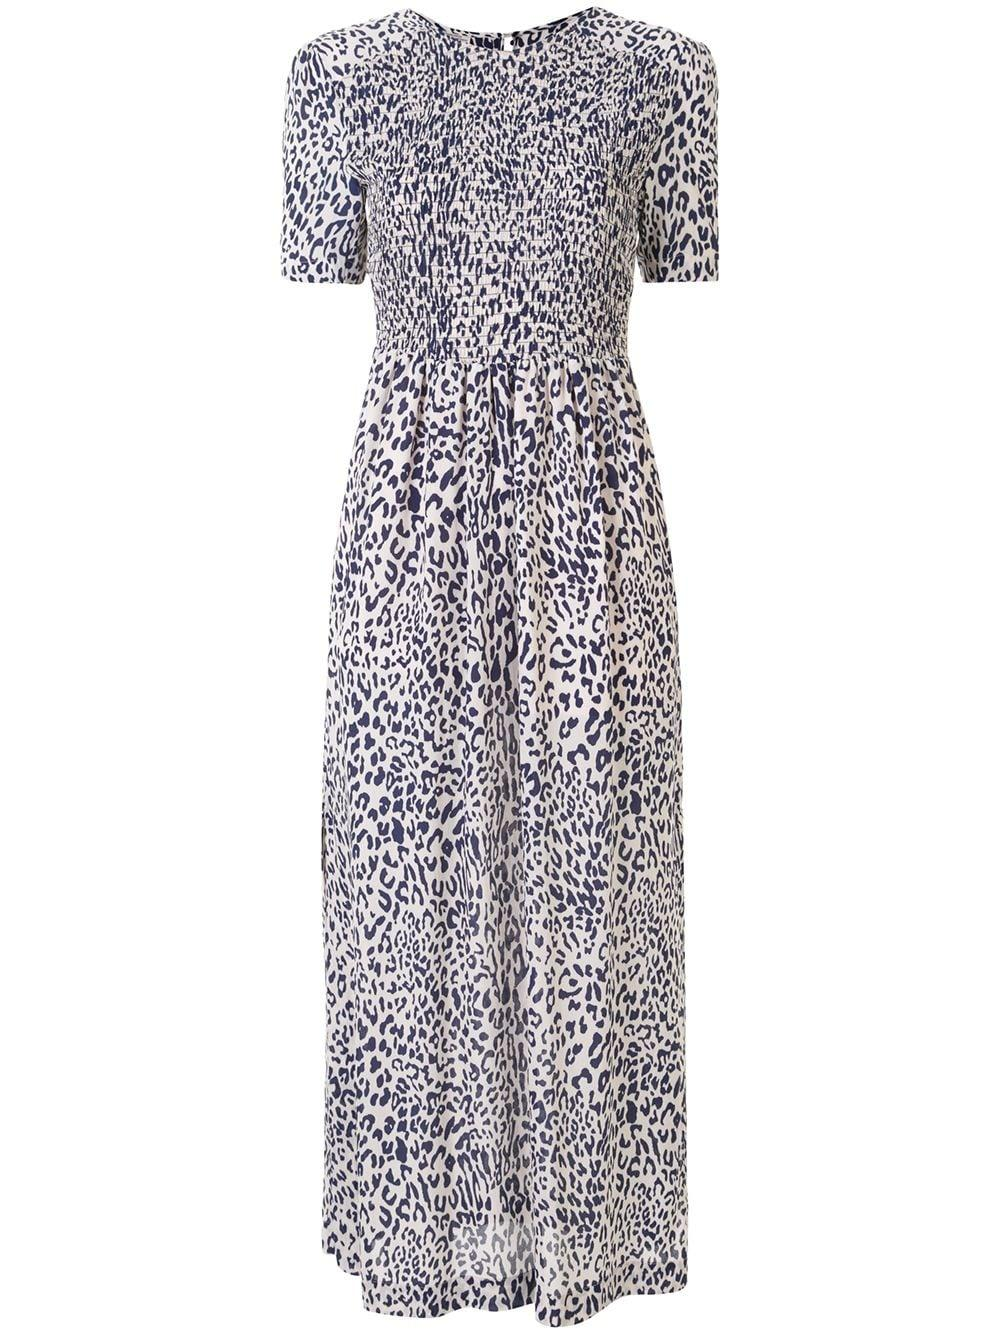 Adamaris Midi Short Sleeve Dress